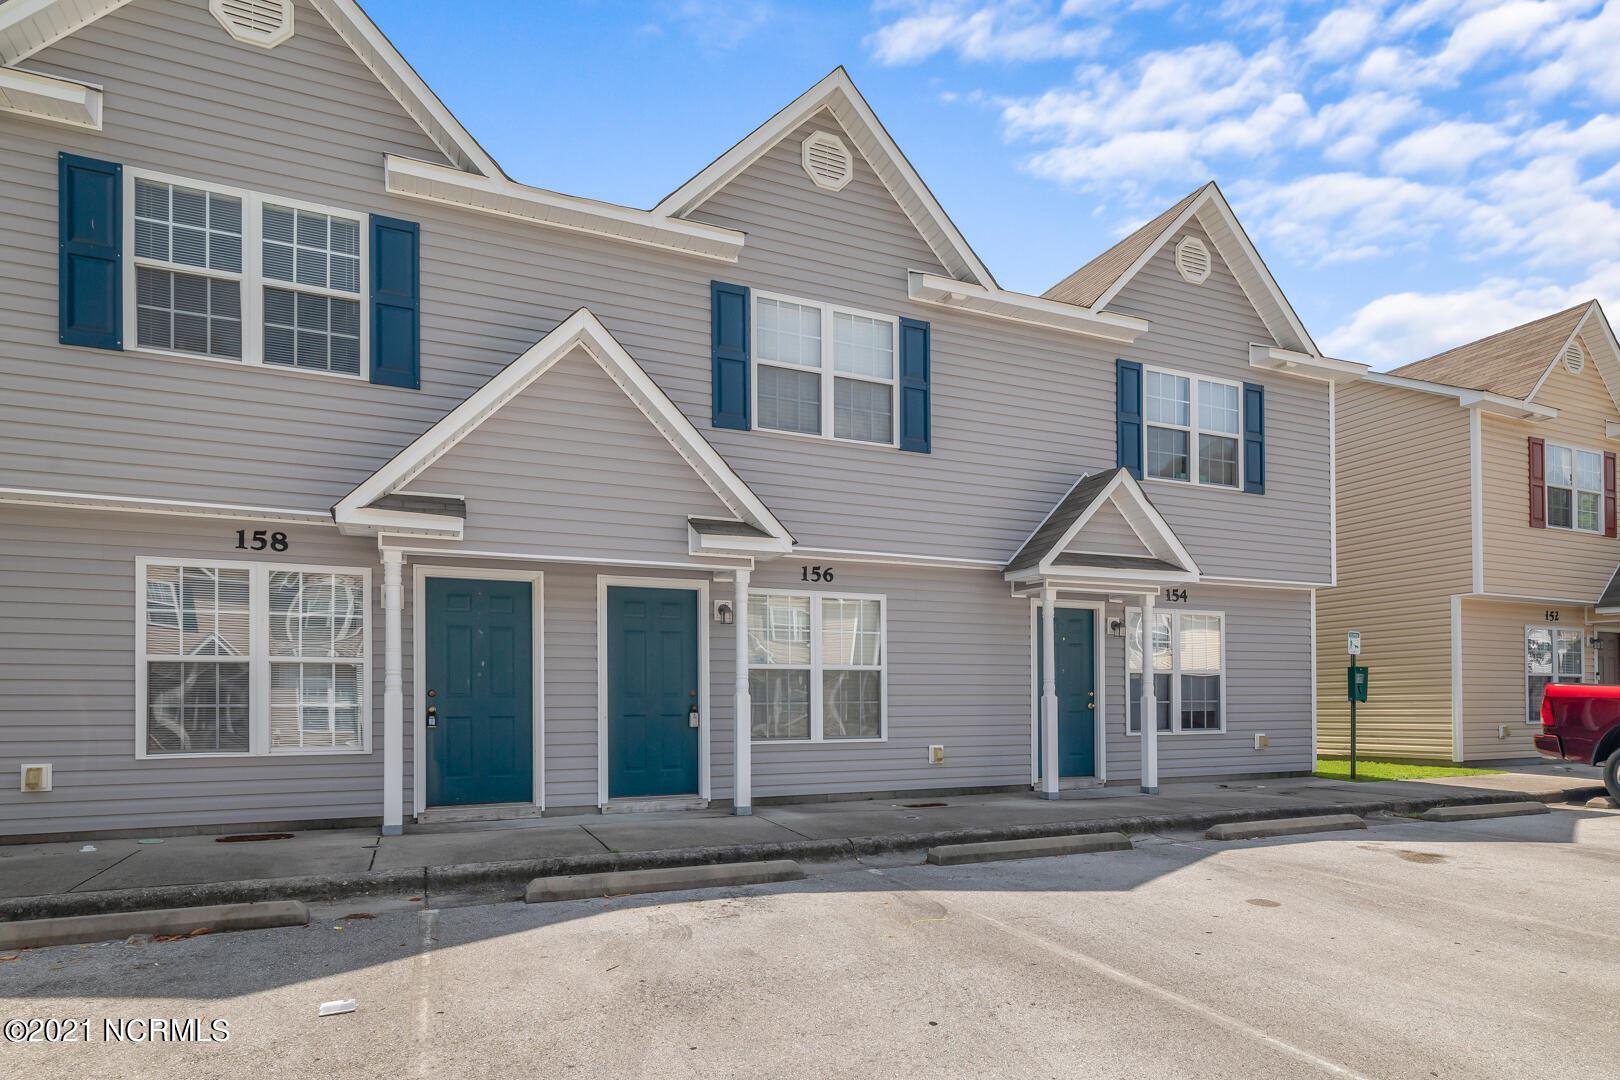 Photo of 156 Cornerstone Place, Jacksonville, NC 28546 (MLS # 100281513)